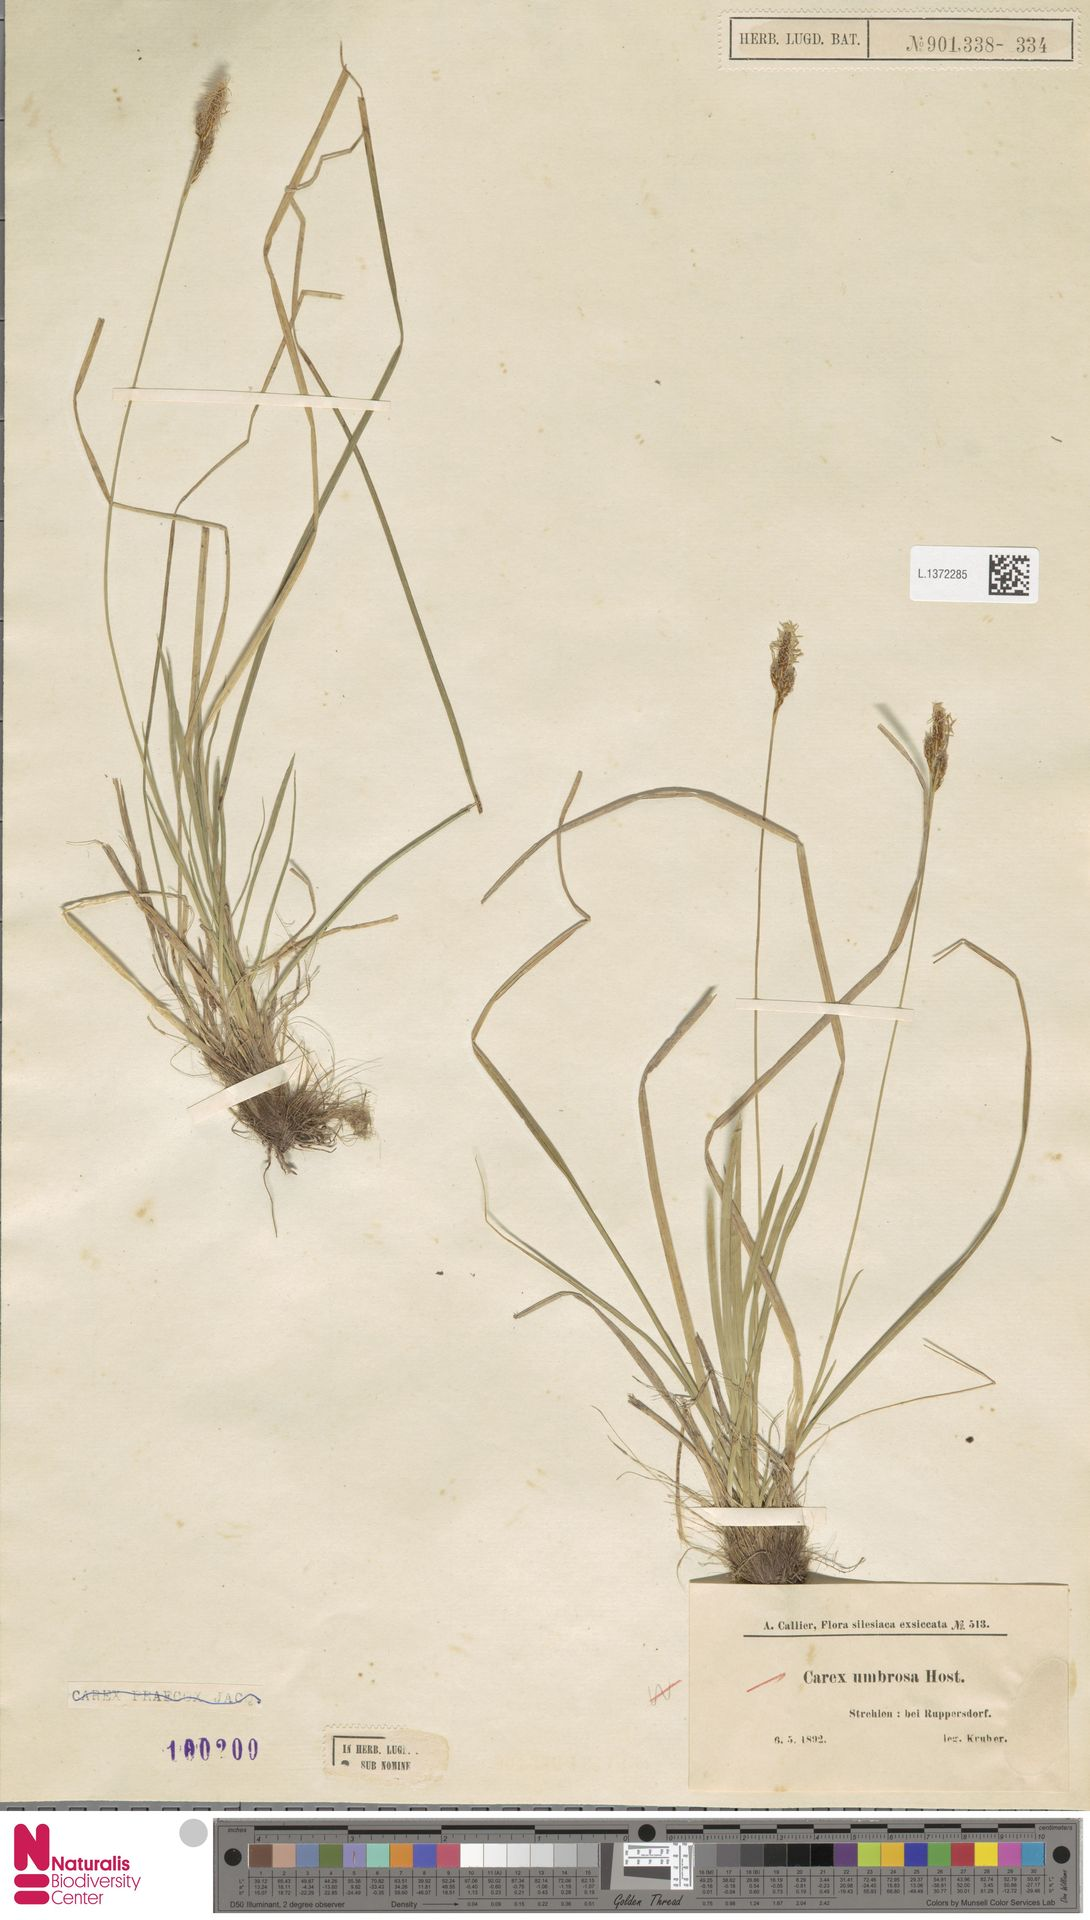 L.1372285   Carex umbrosa Host